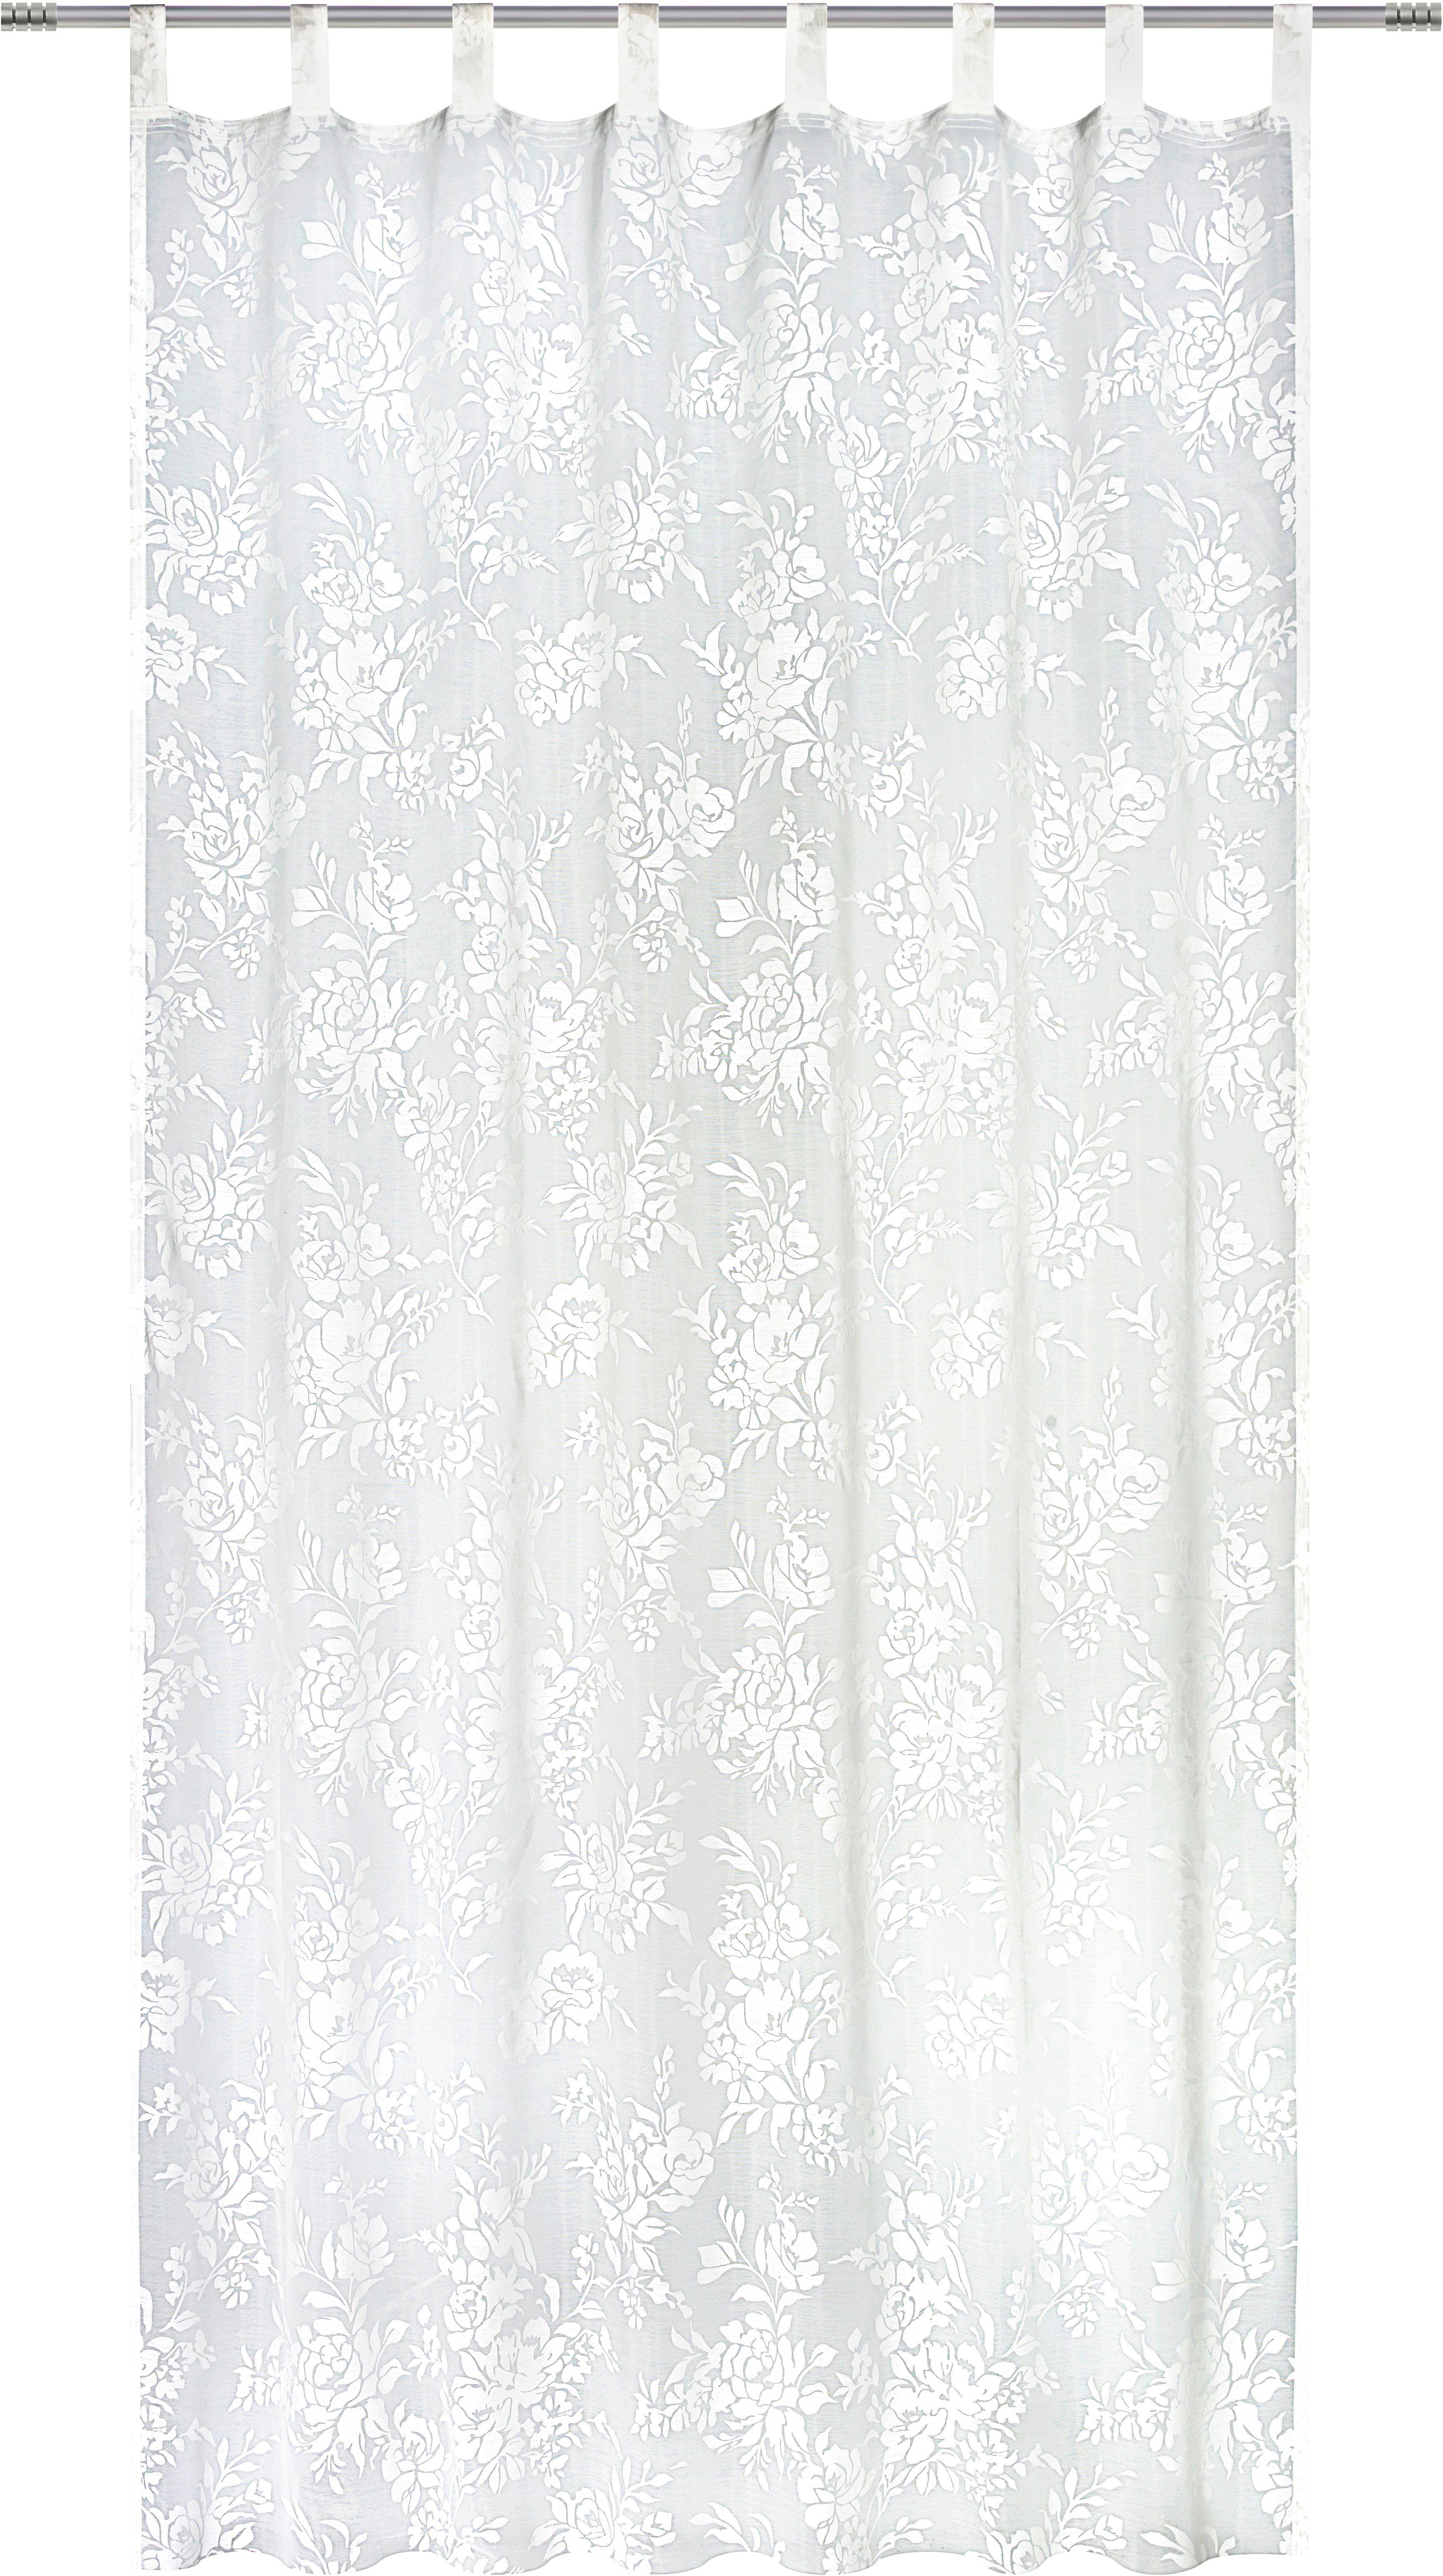 Schlaufenschal Rosalie, ca. 140x245cm - Naturfarben, ROMANTIK / LANDHAUS, Textil (140/245cm) - MÖMAX modern living